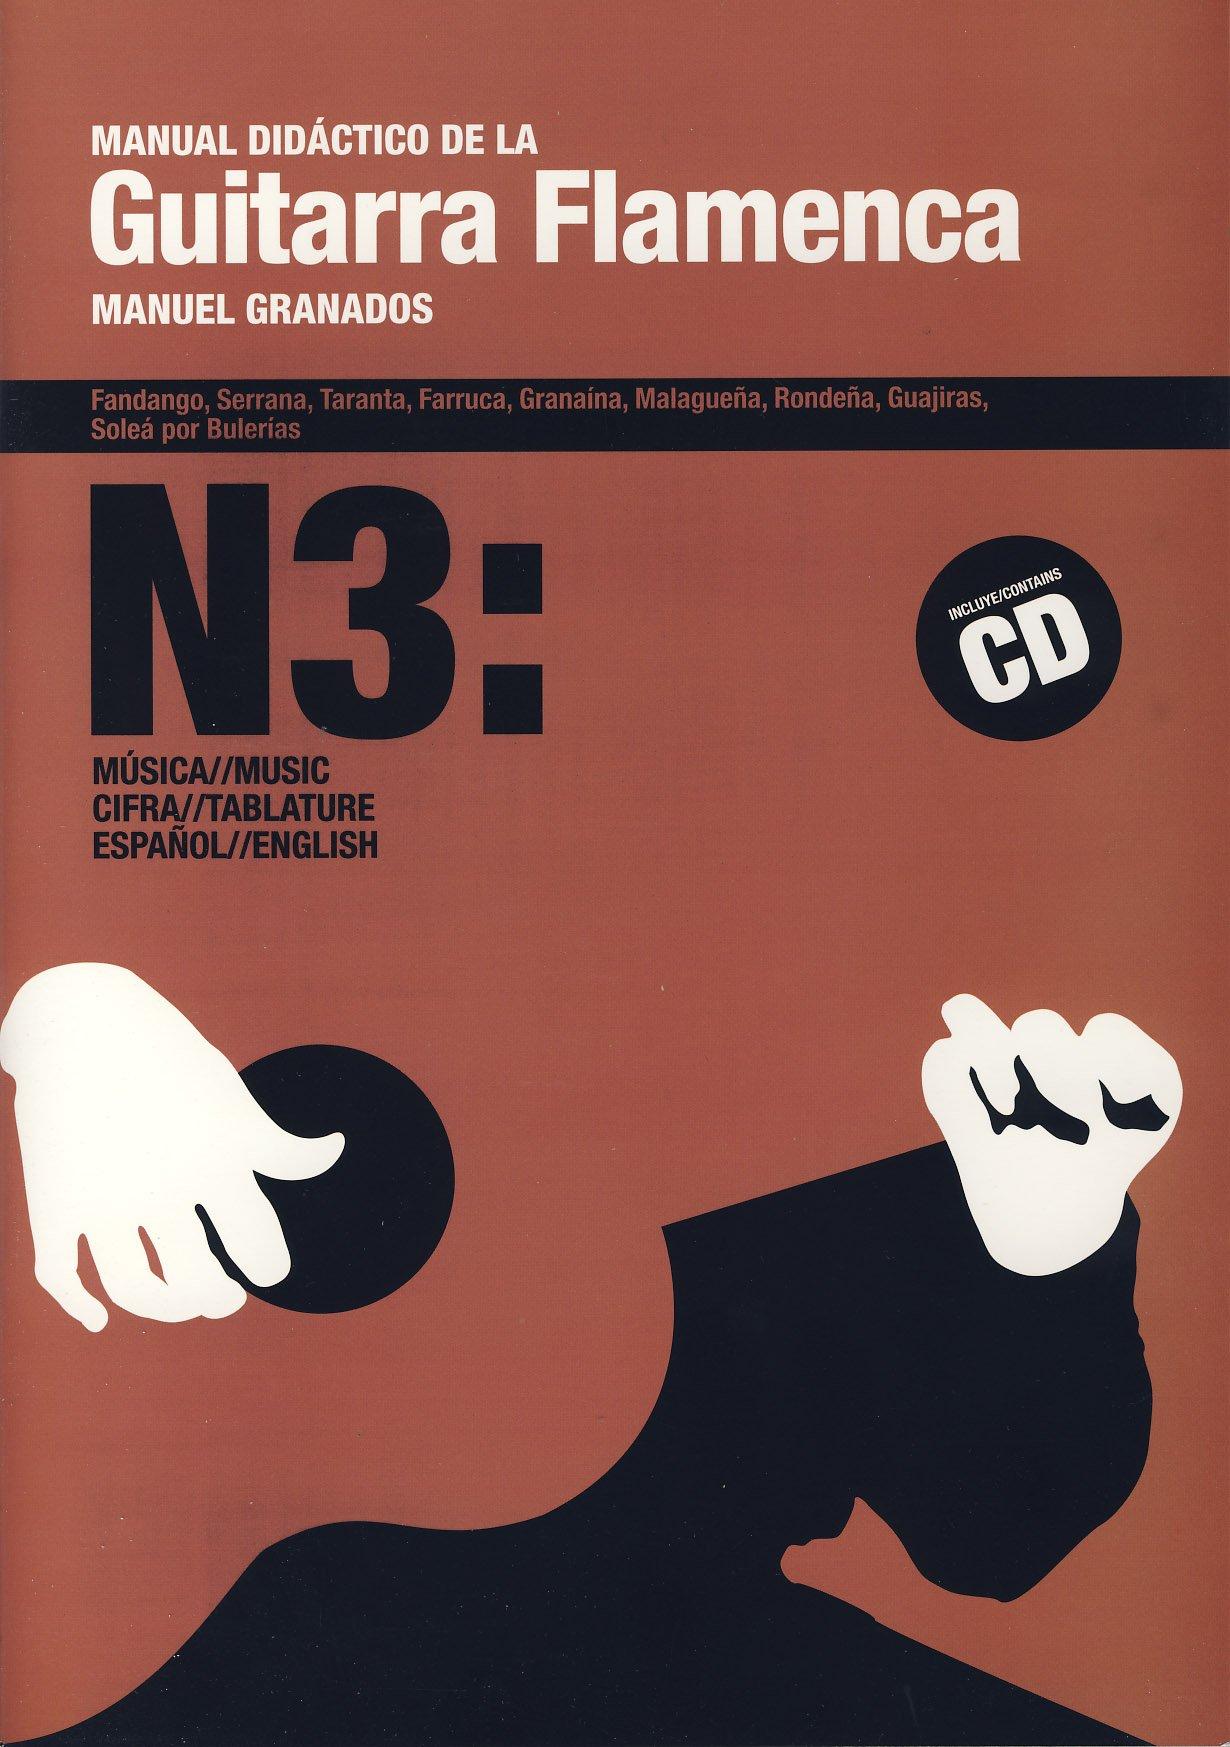 GRANADOS M. - Manual Didactico para Guitarra Flamenca 3º Inc.CD ...